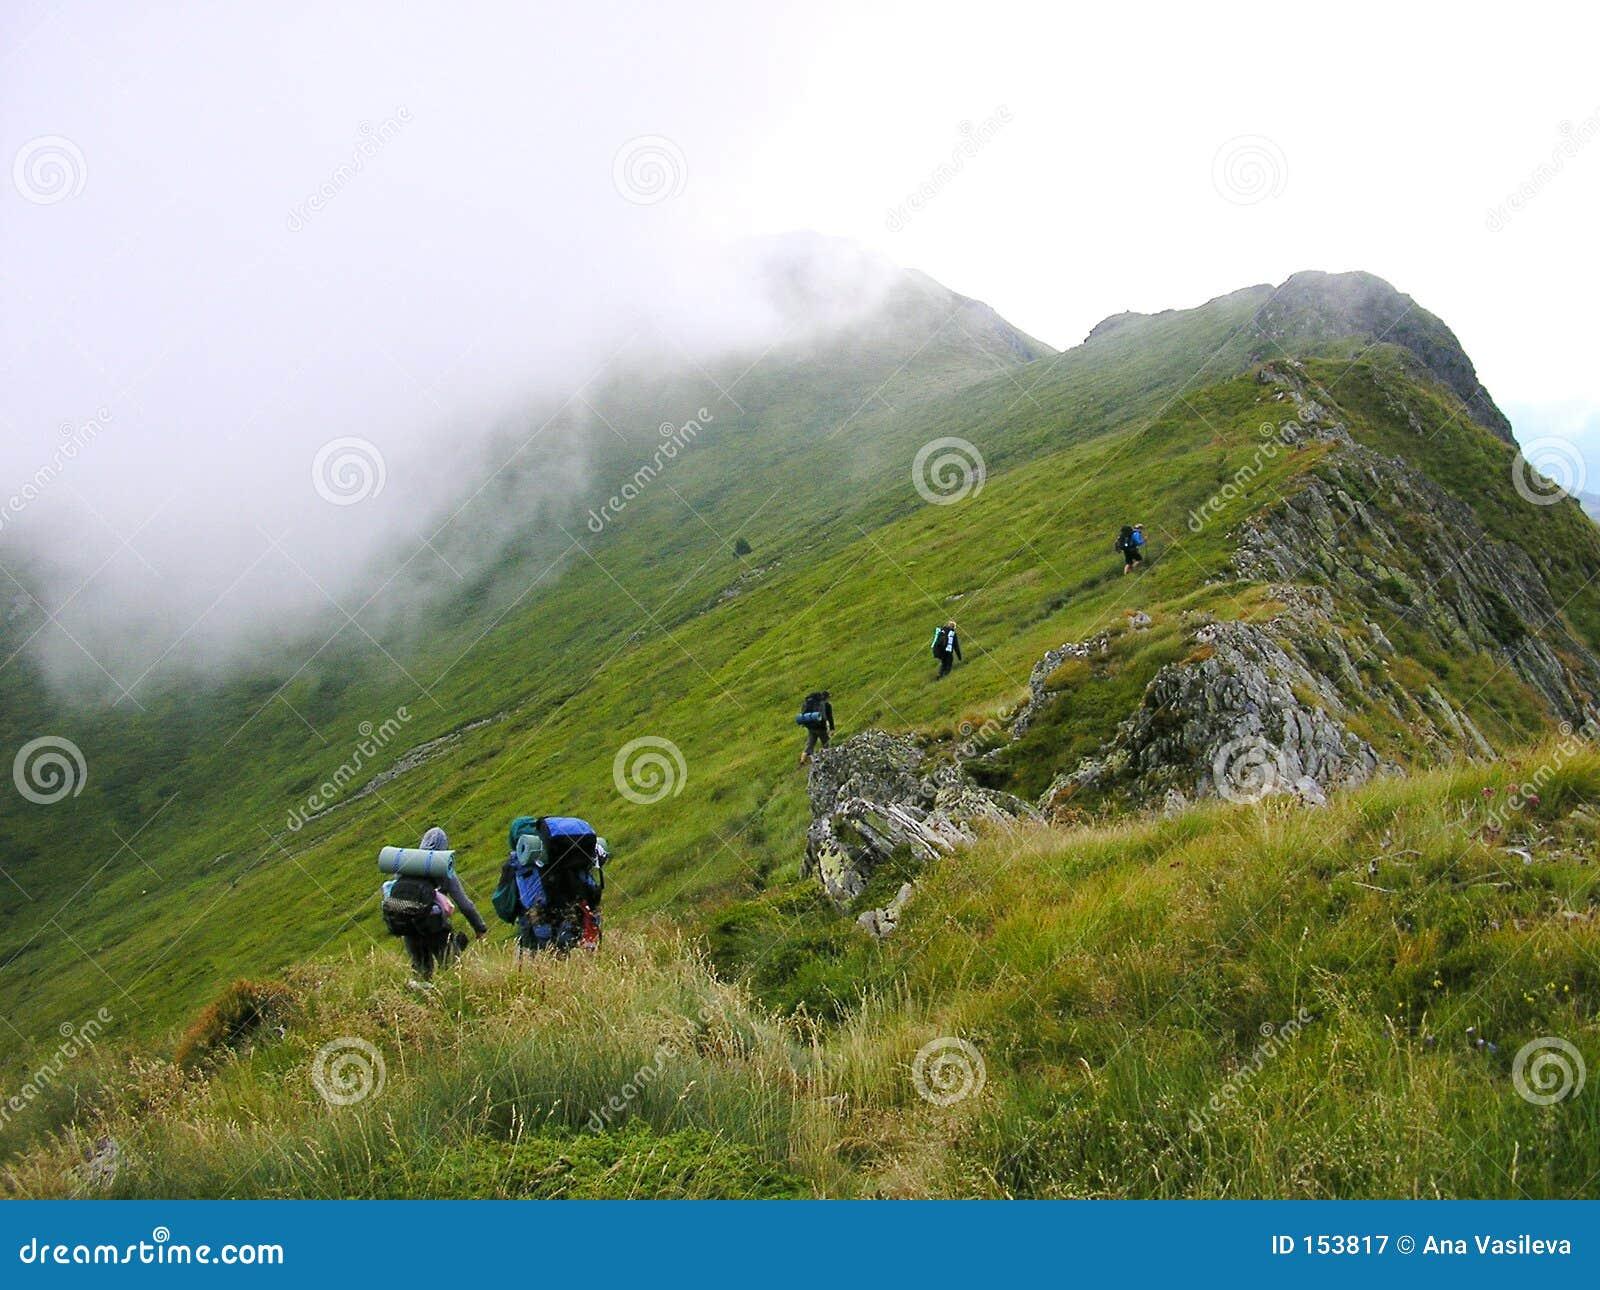 A Group Of Tourists On A Mountain Ridge